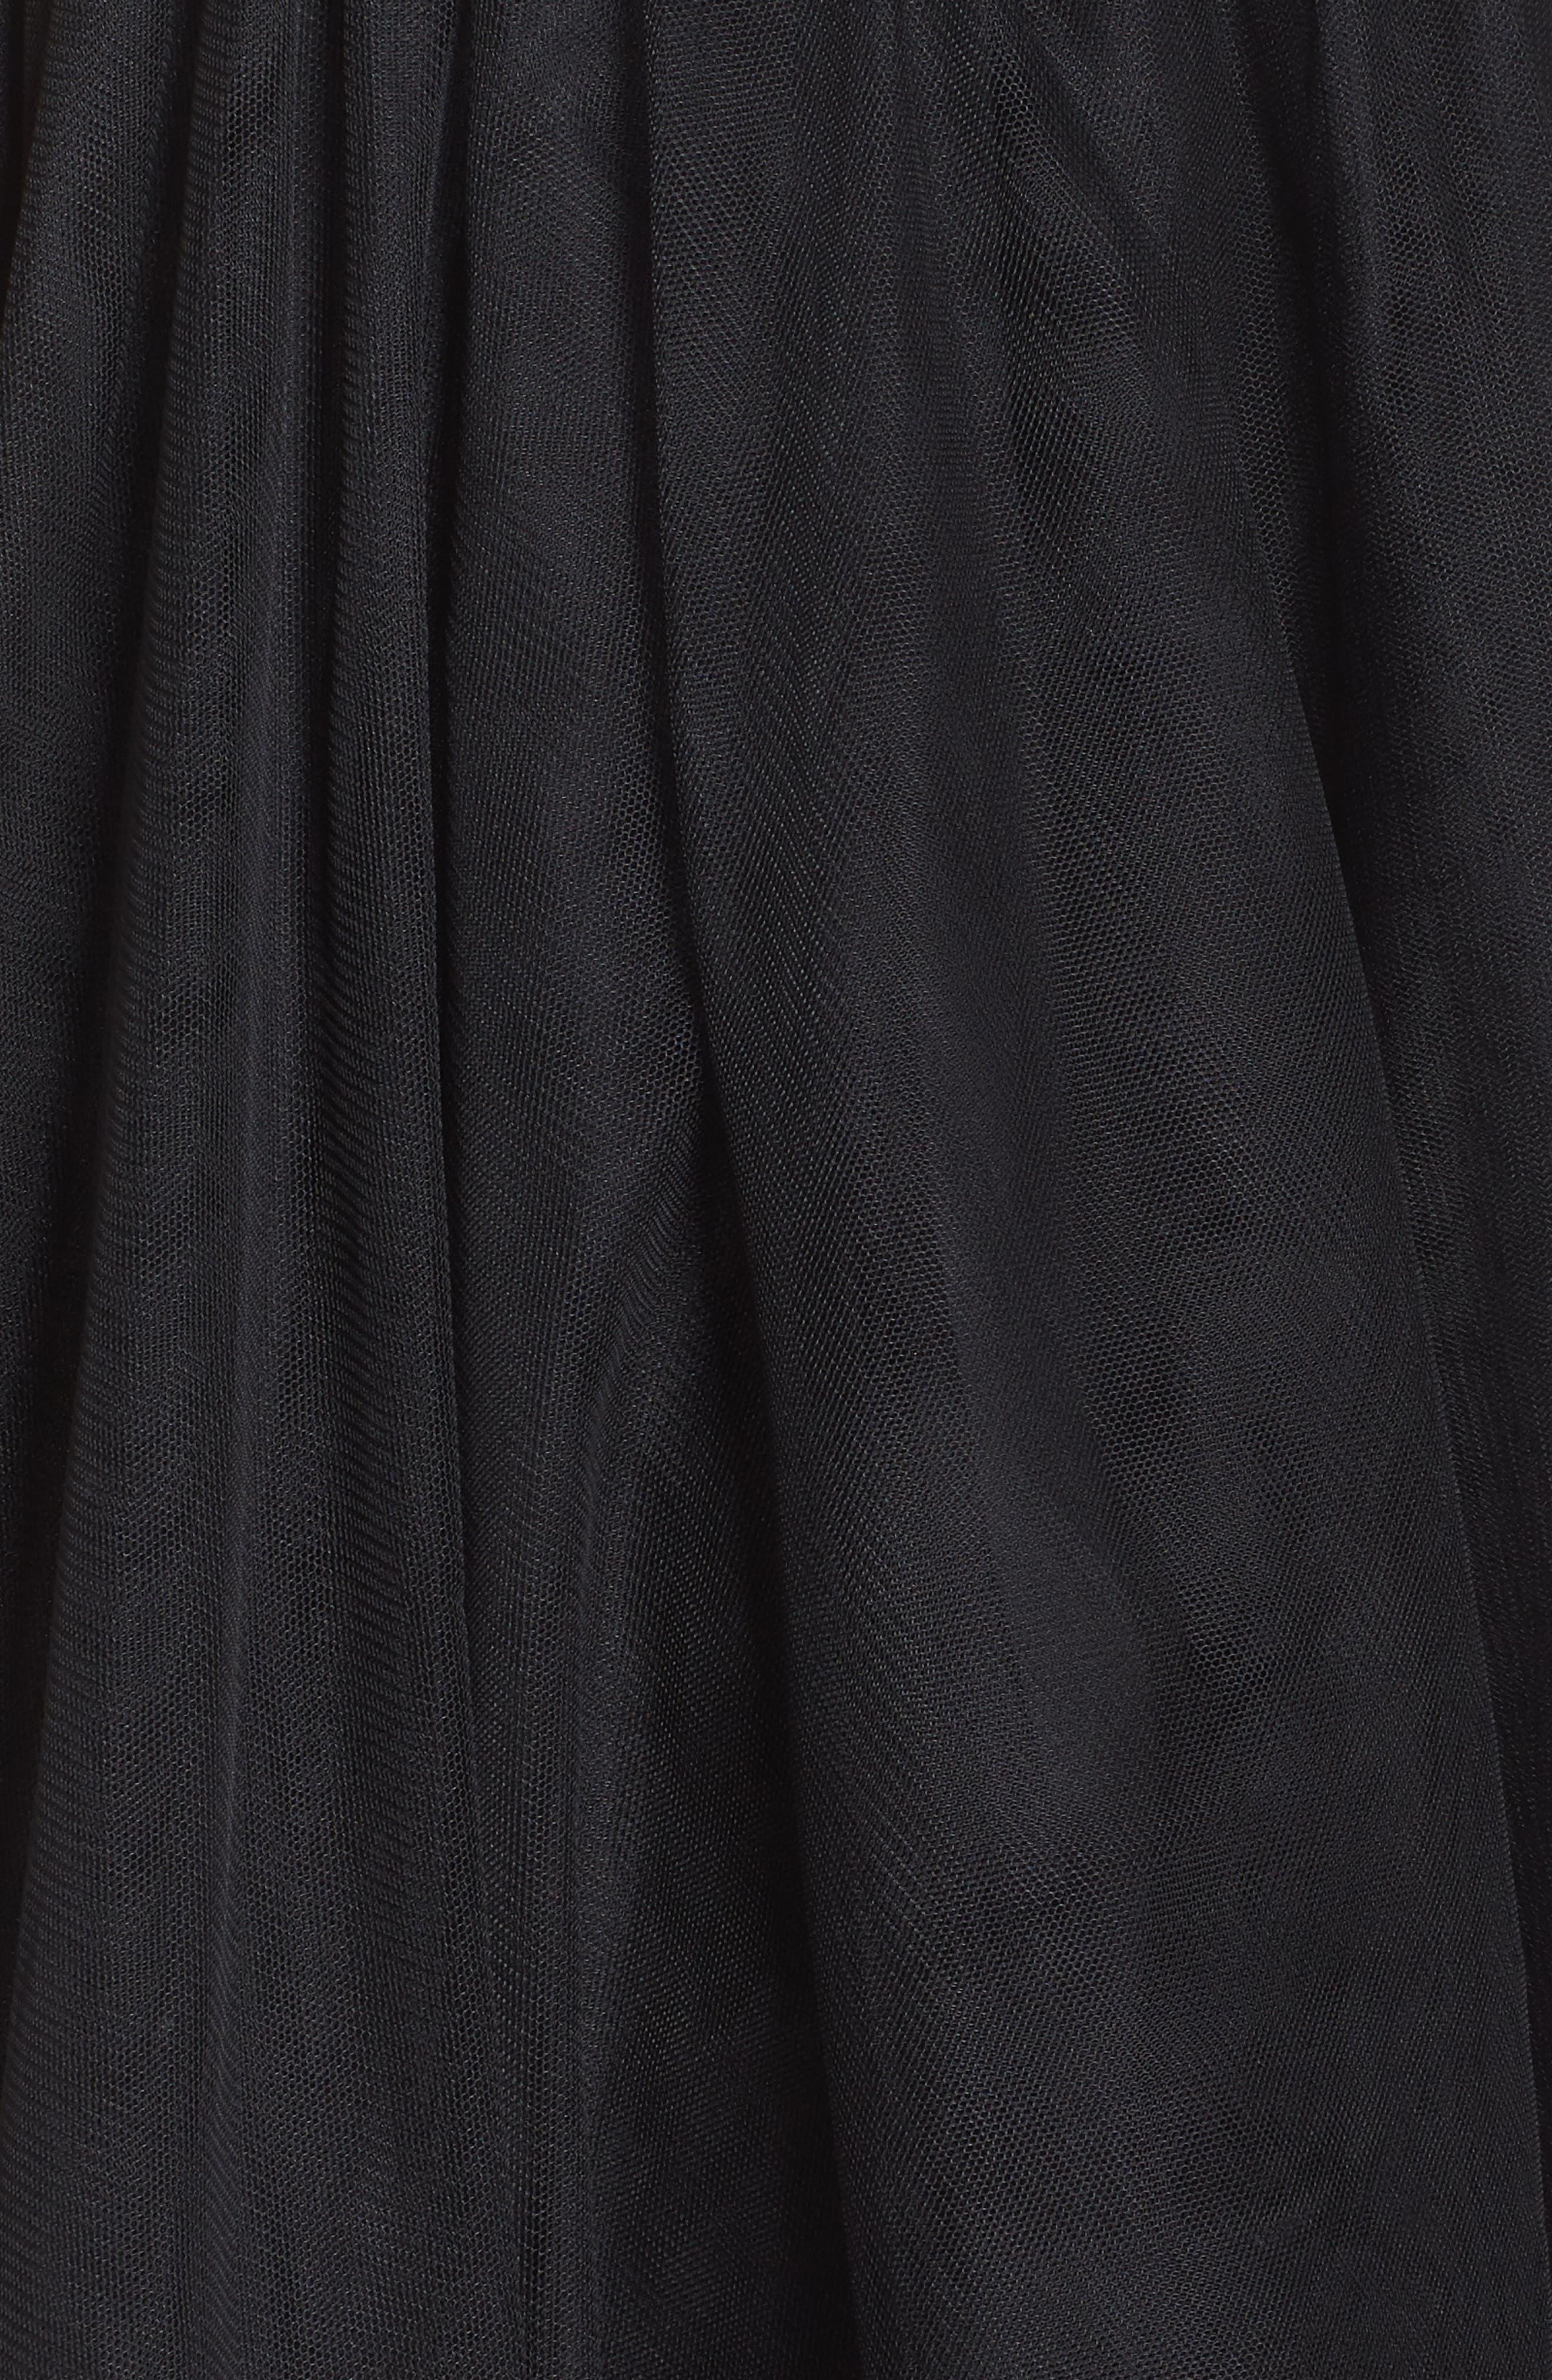 Appliqué Sweetheart Fit & Flare Dress,                             Alternate thumbnail 6, color,                             BLACK/ ROSE